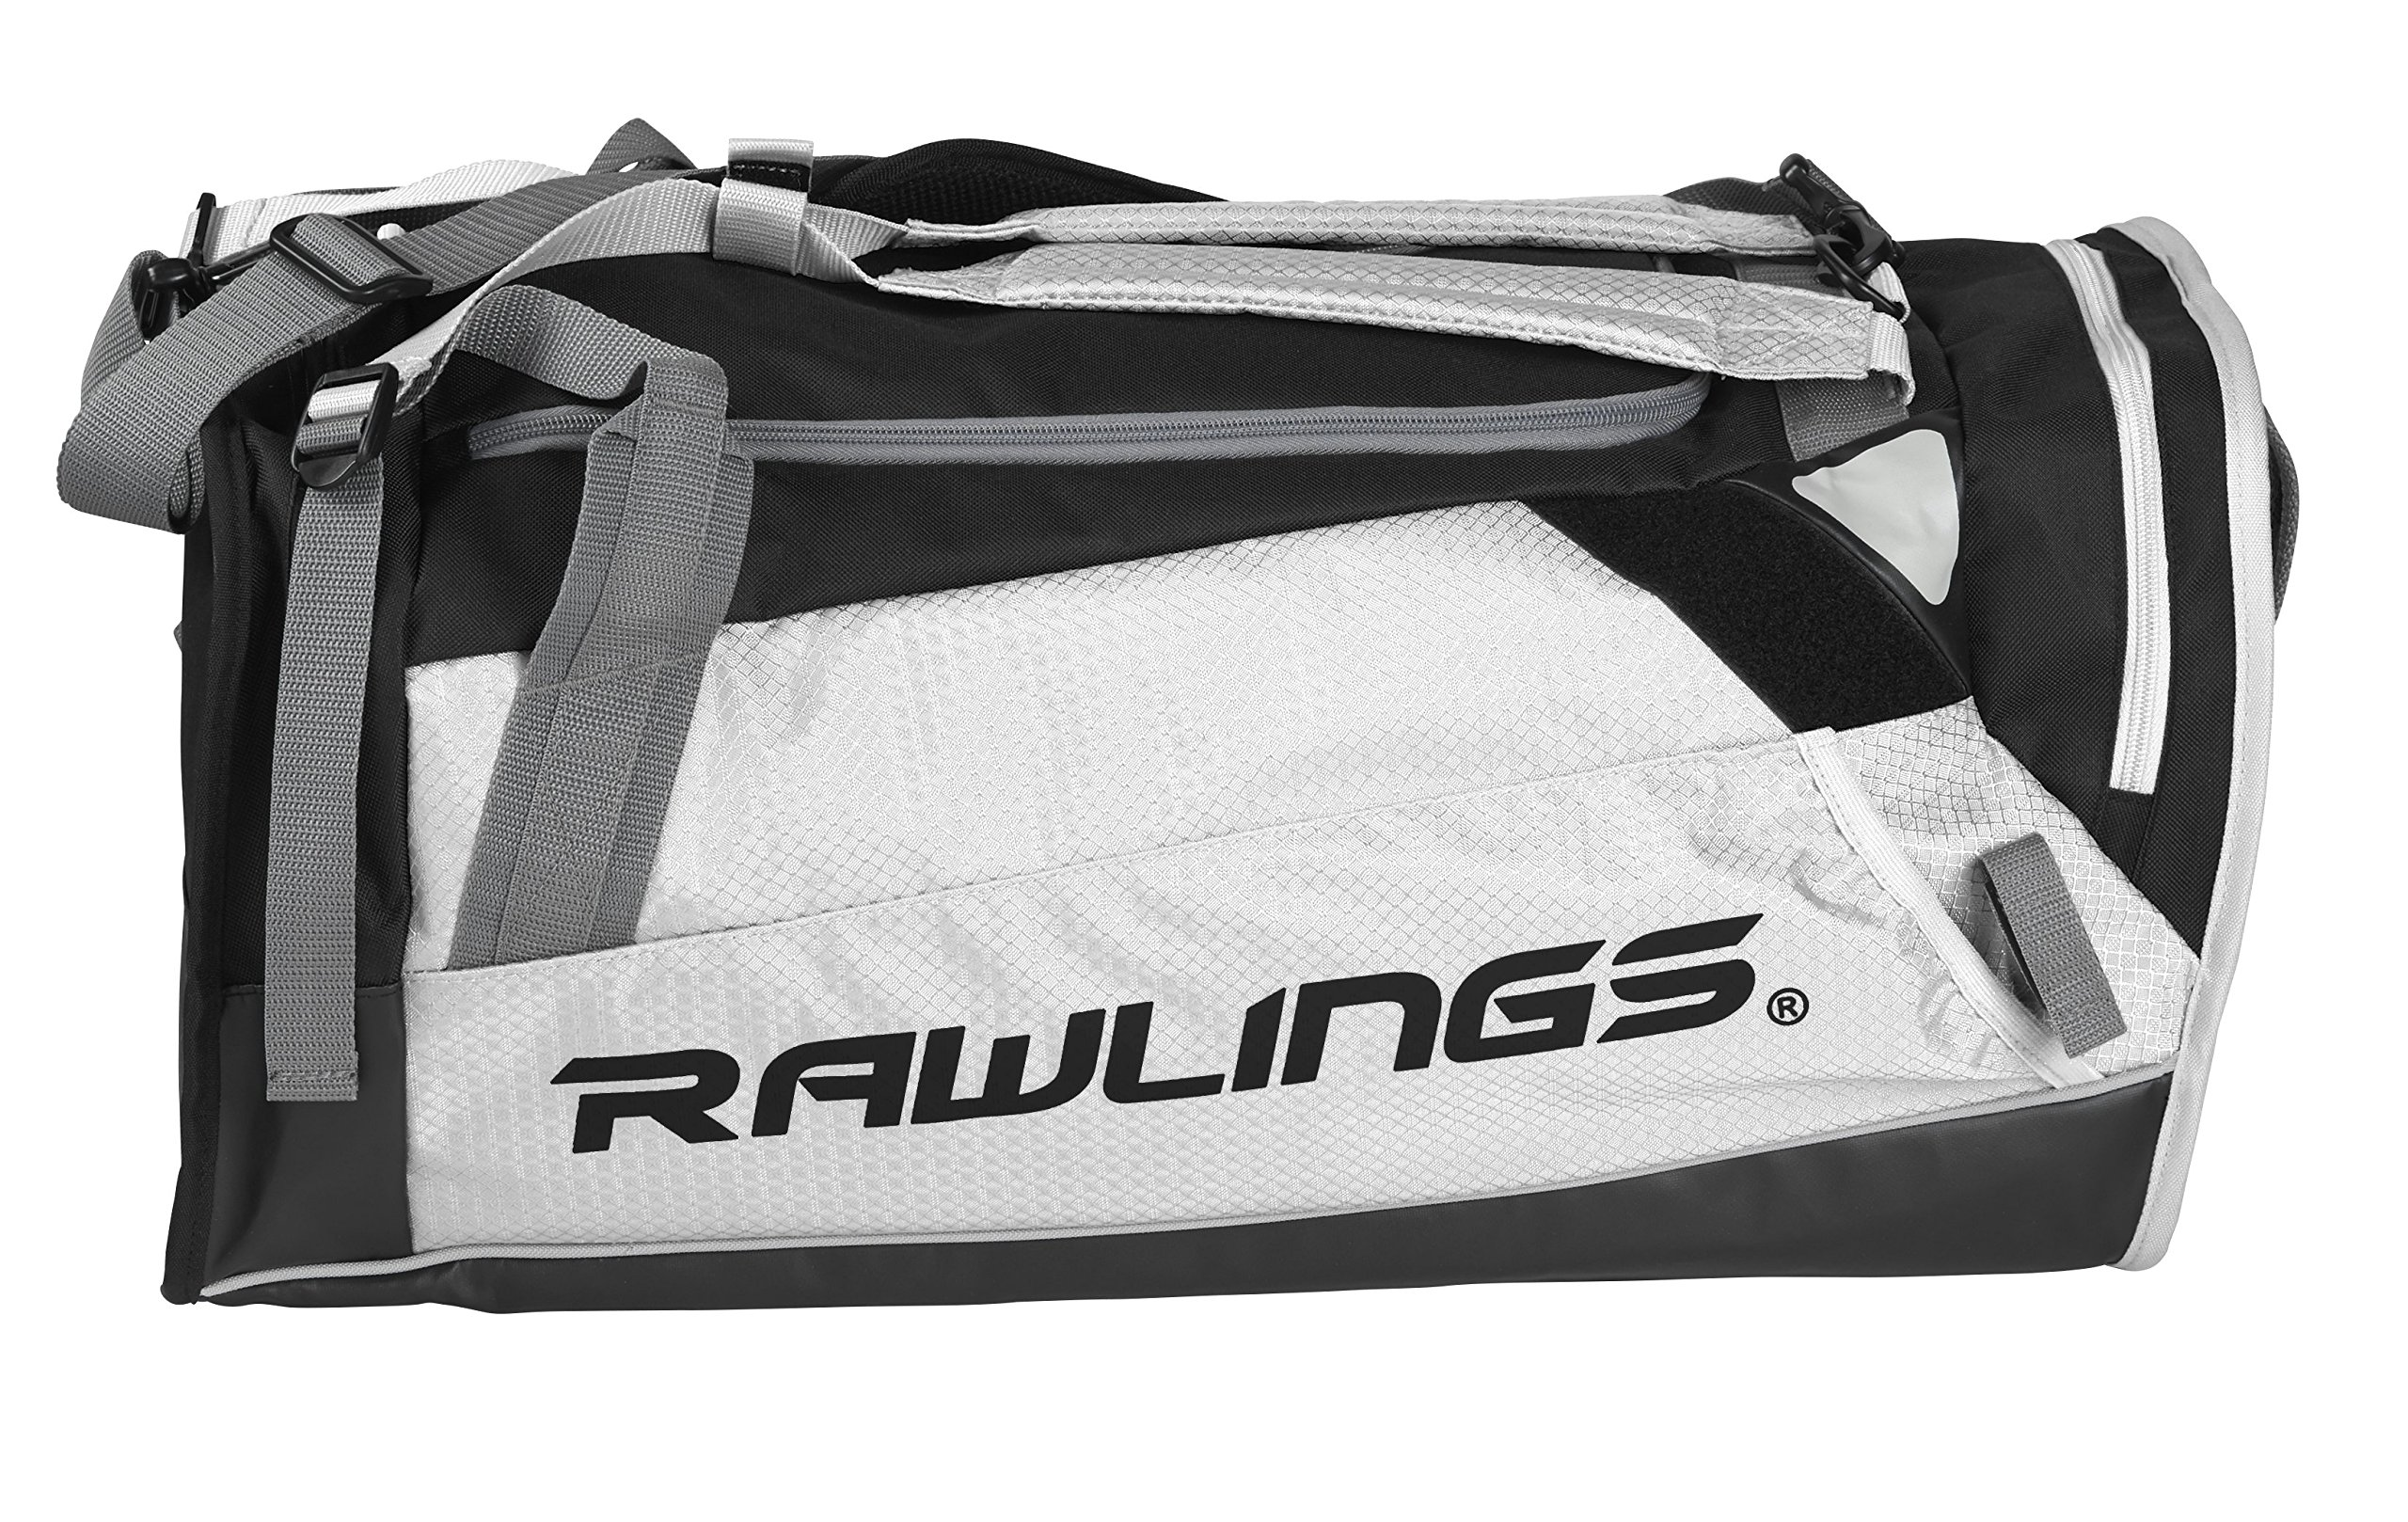 Rawlings Hybrid Duffel/Backpack Baseball/Softball Bag, White by Rawlings